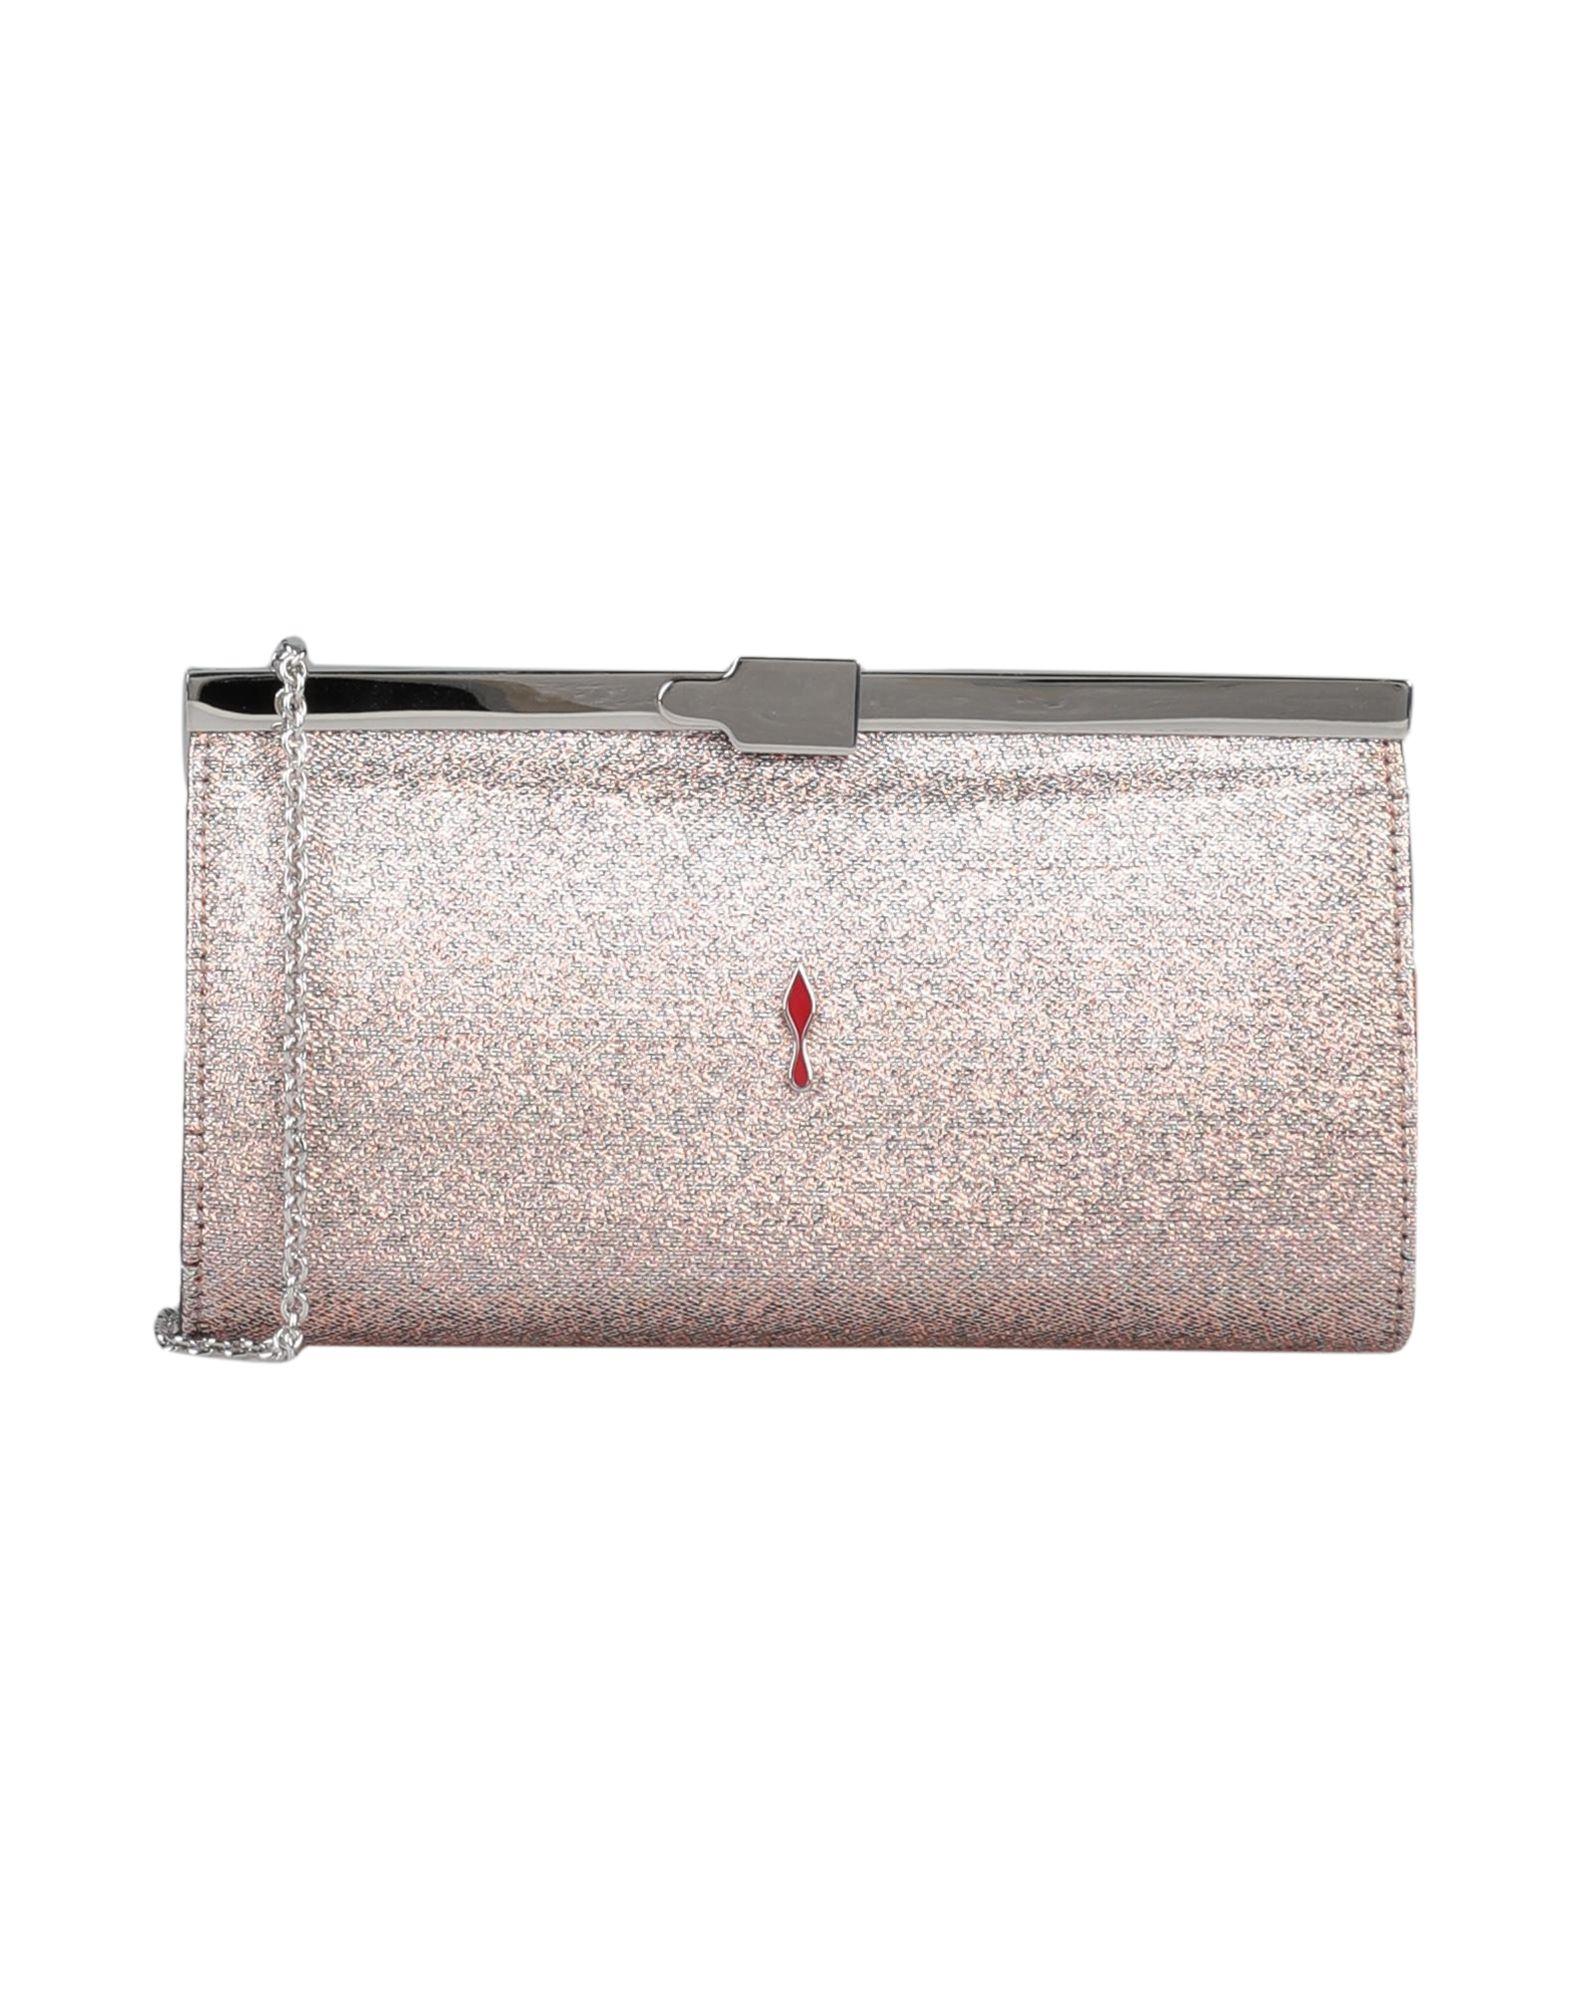 CHRISTIAN LOUBOUTIN Handbags. crepe, lamé, laminated effect, metal applications, logo, solid color, framed closure, bag handle, metallic straps, leather lining, mini. Textile fibers